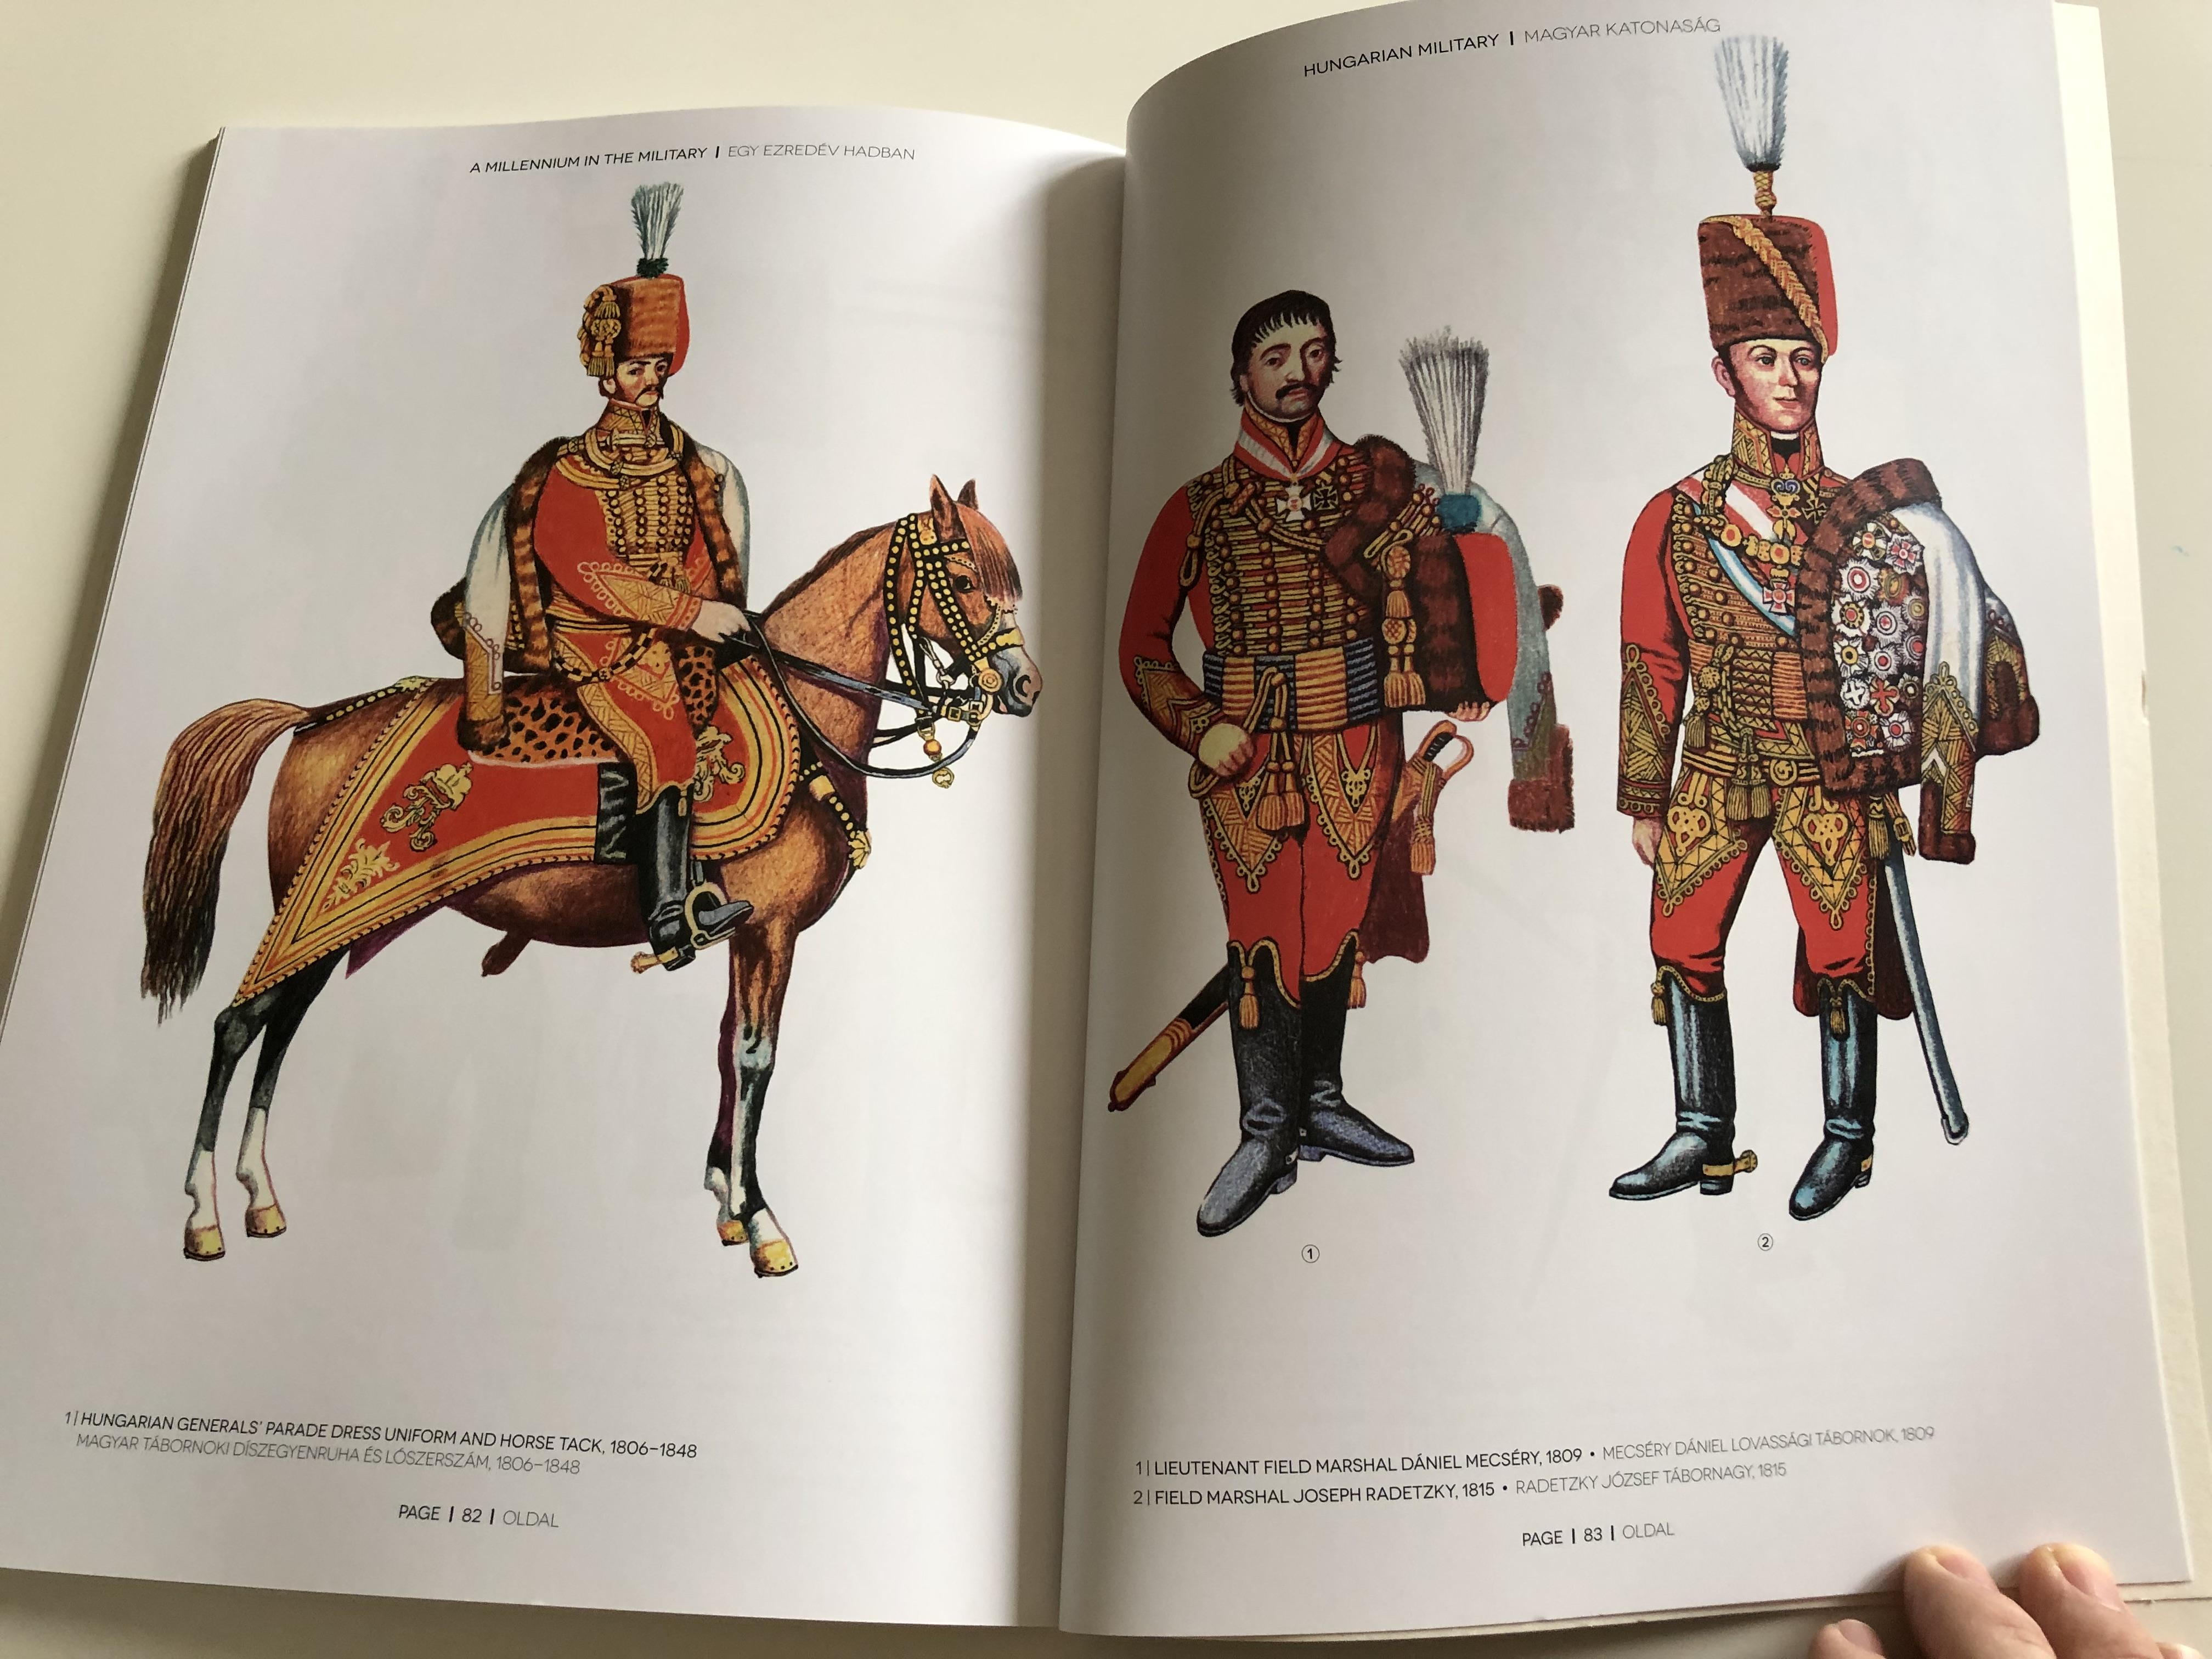 hungarian-military-1768-1848-by-gy-z-somogyi-magyar-katonas-g-1768-1848-a-millennium-in-the-military-egy-ezred-v-hadban-paperback-2013-hm-zr-nyi-12-.jpg